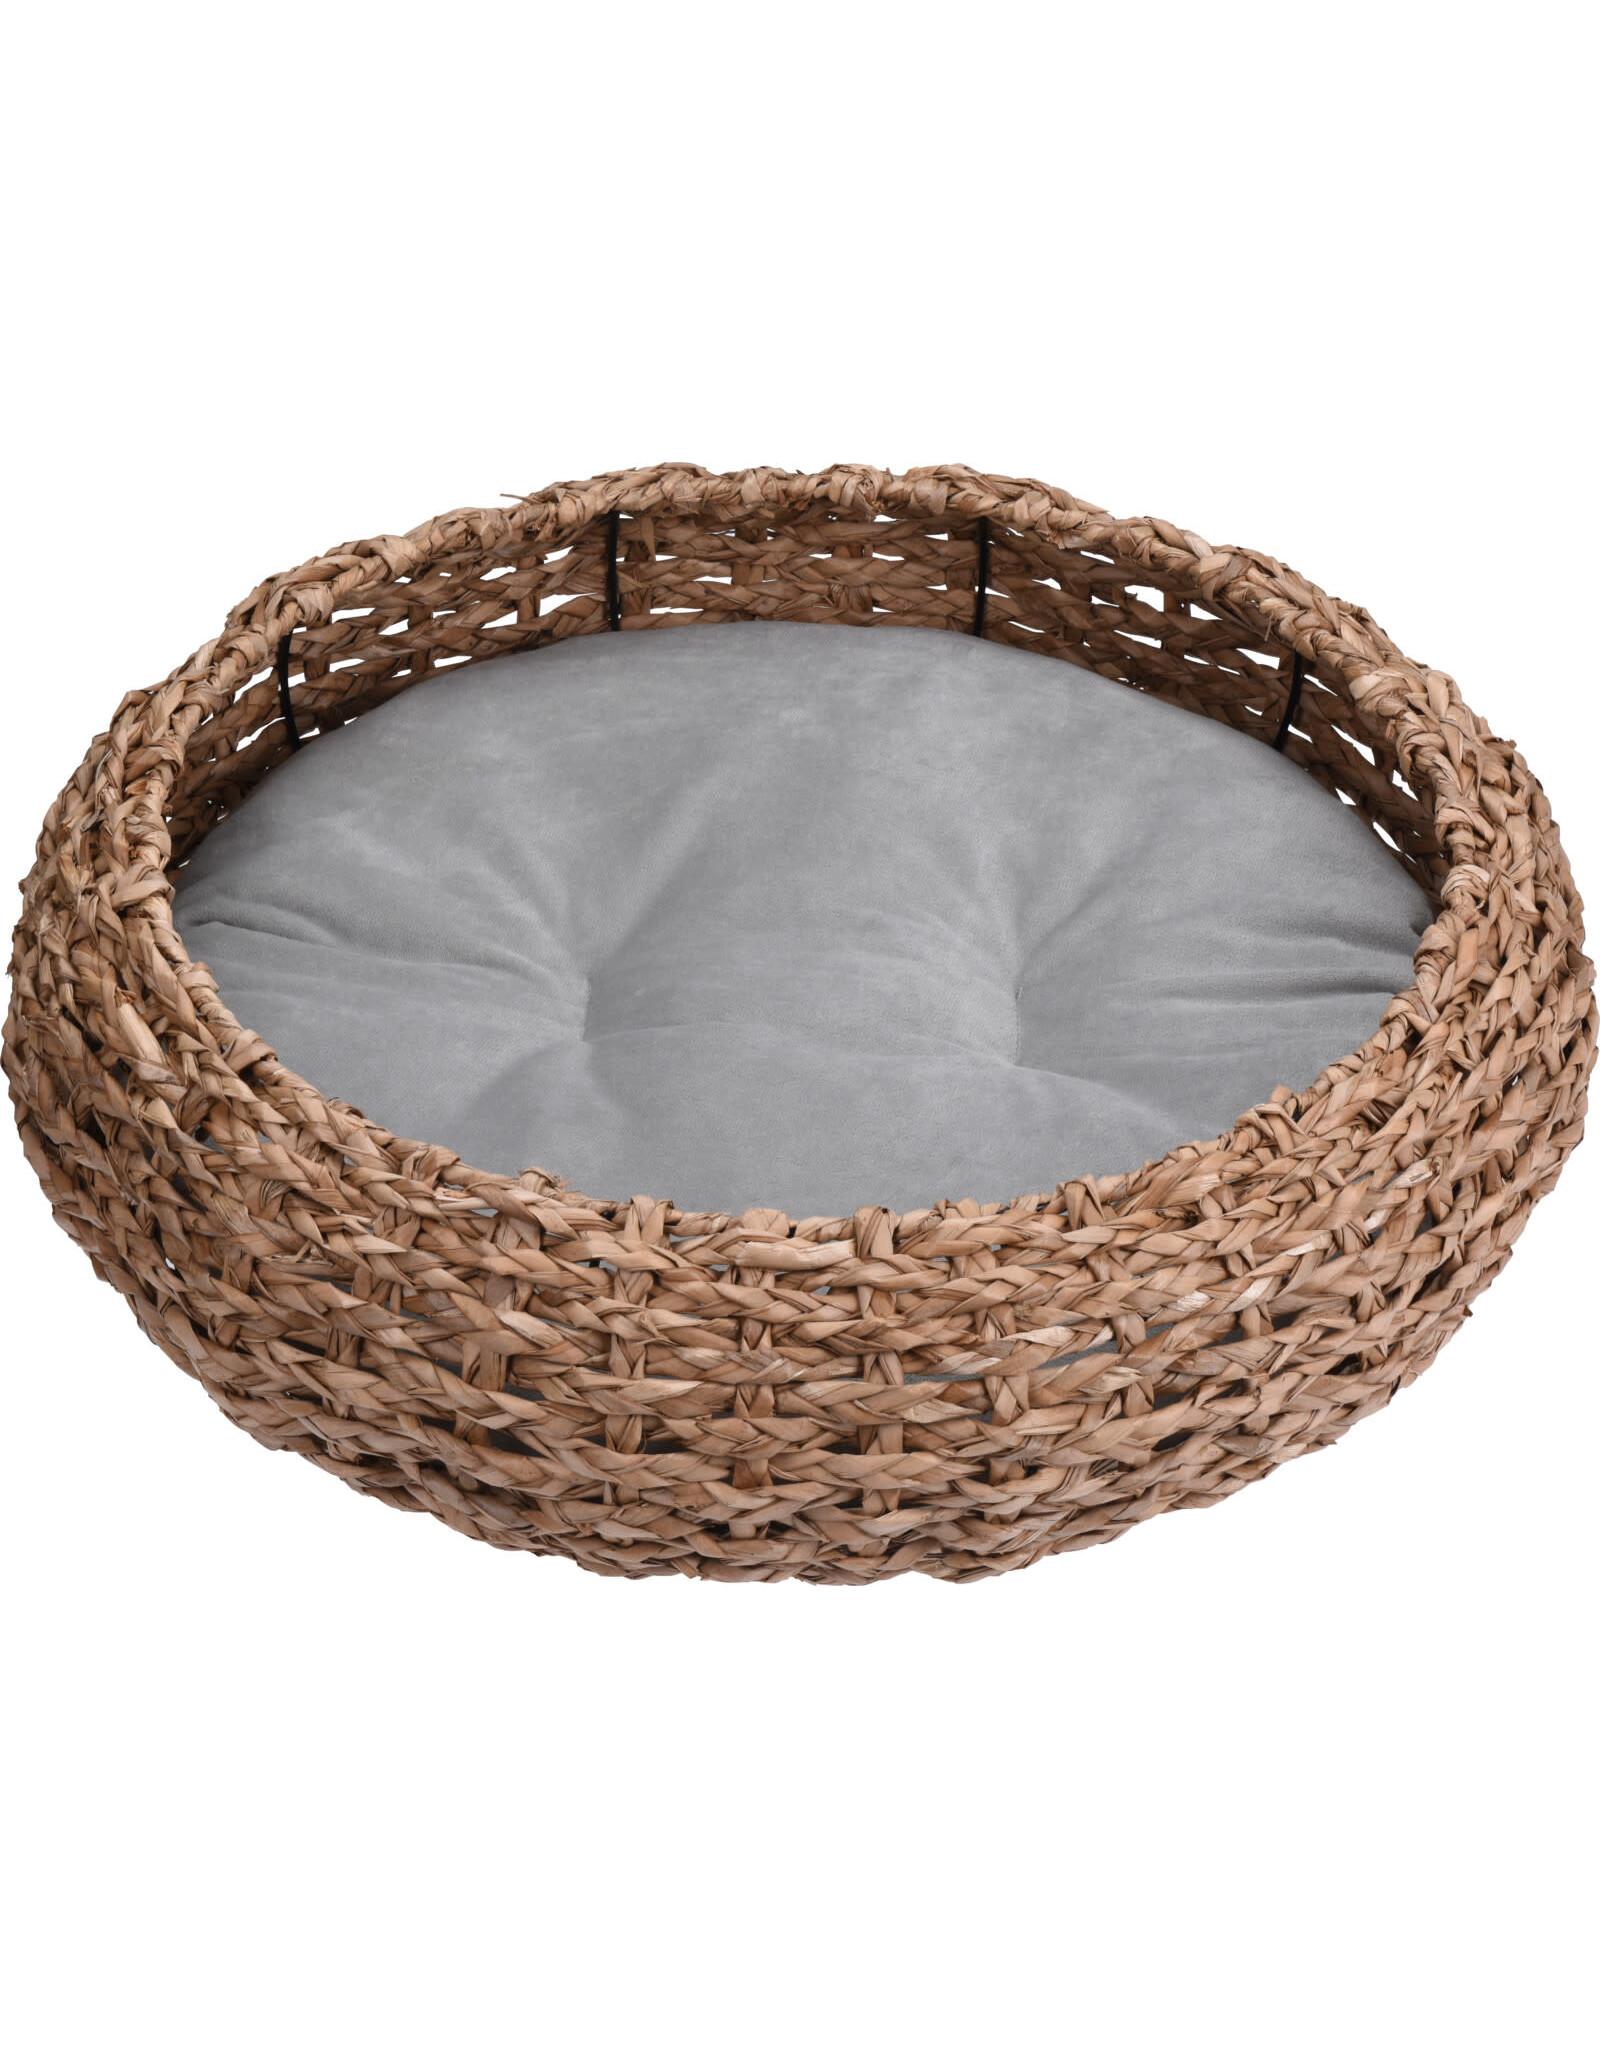 Koopman Basket Pets W Cushion 68X20Cm